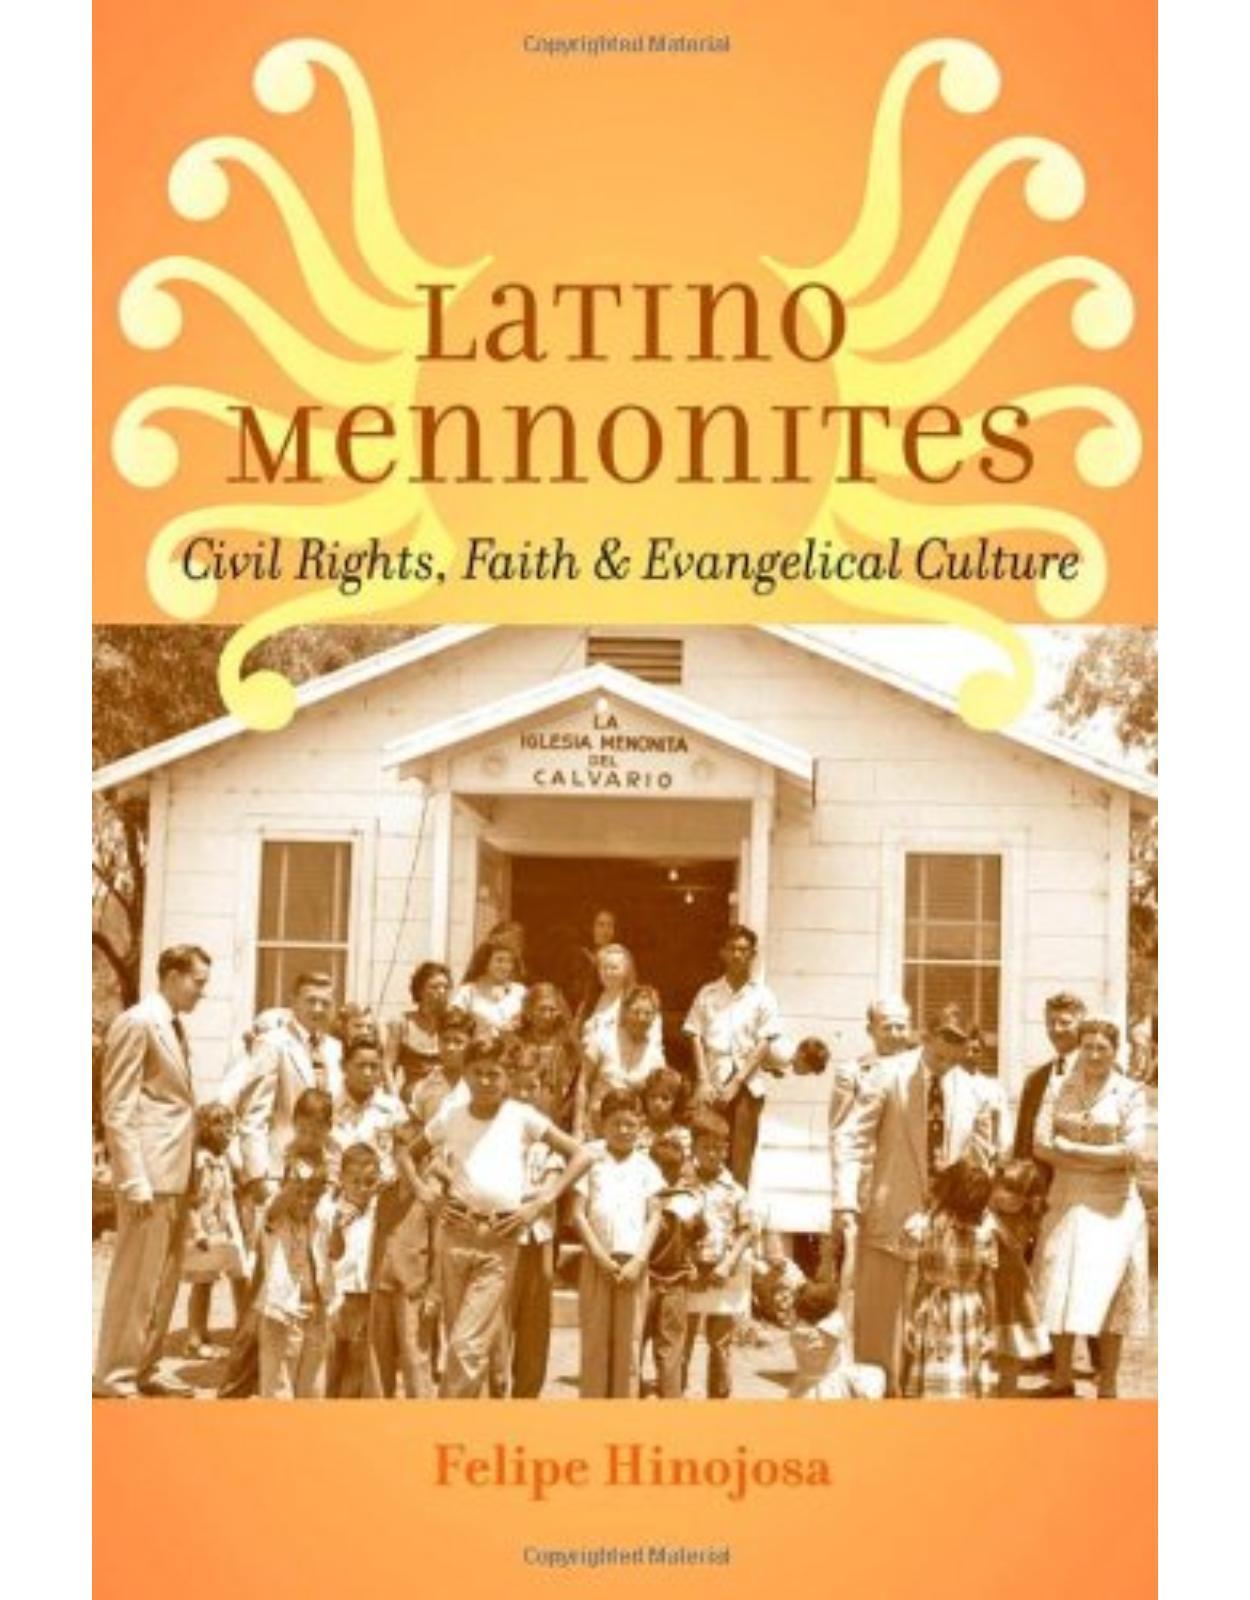 Latino Mennonites, Civil Rights, Faith, and Evangelical Culture